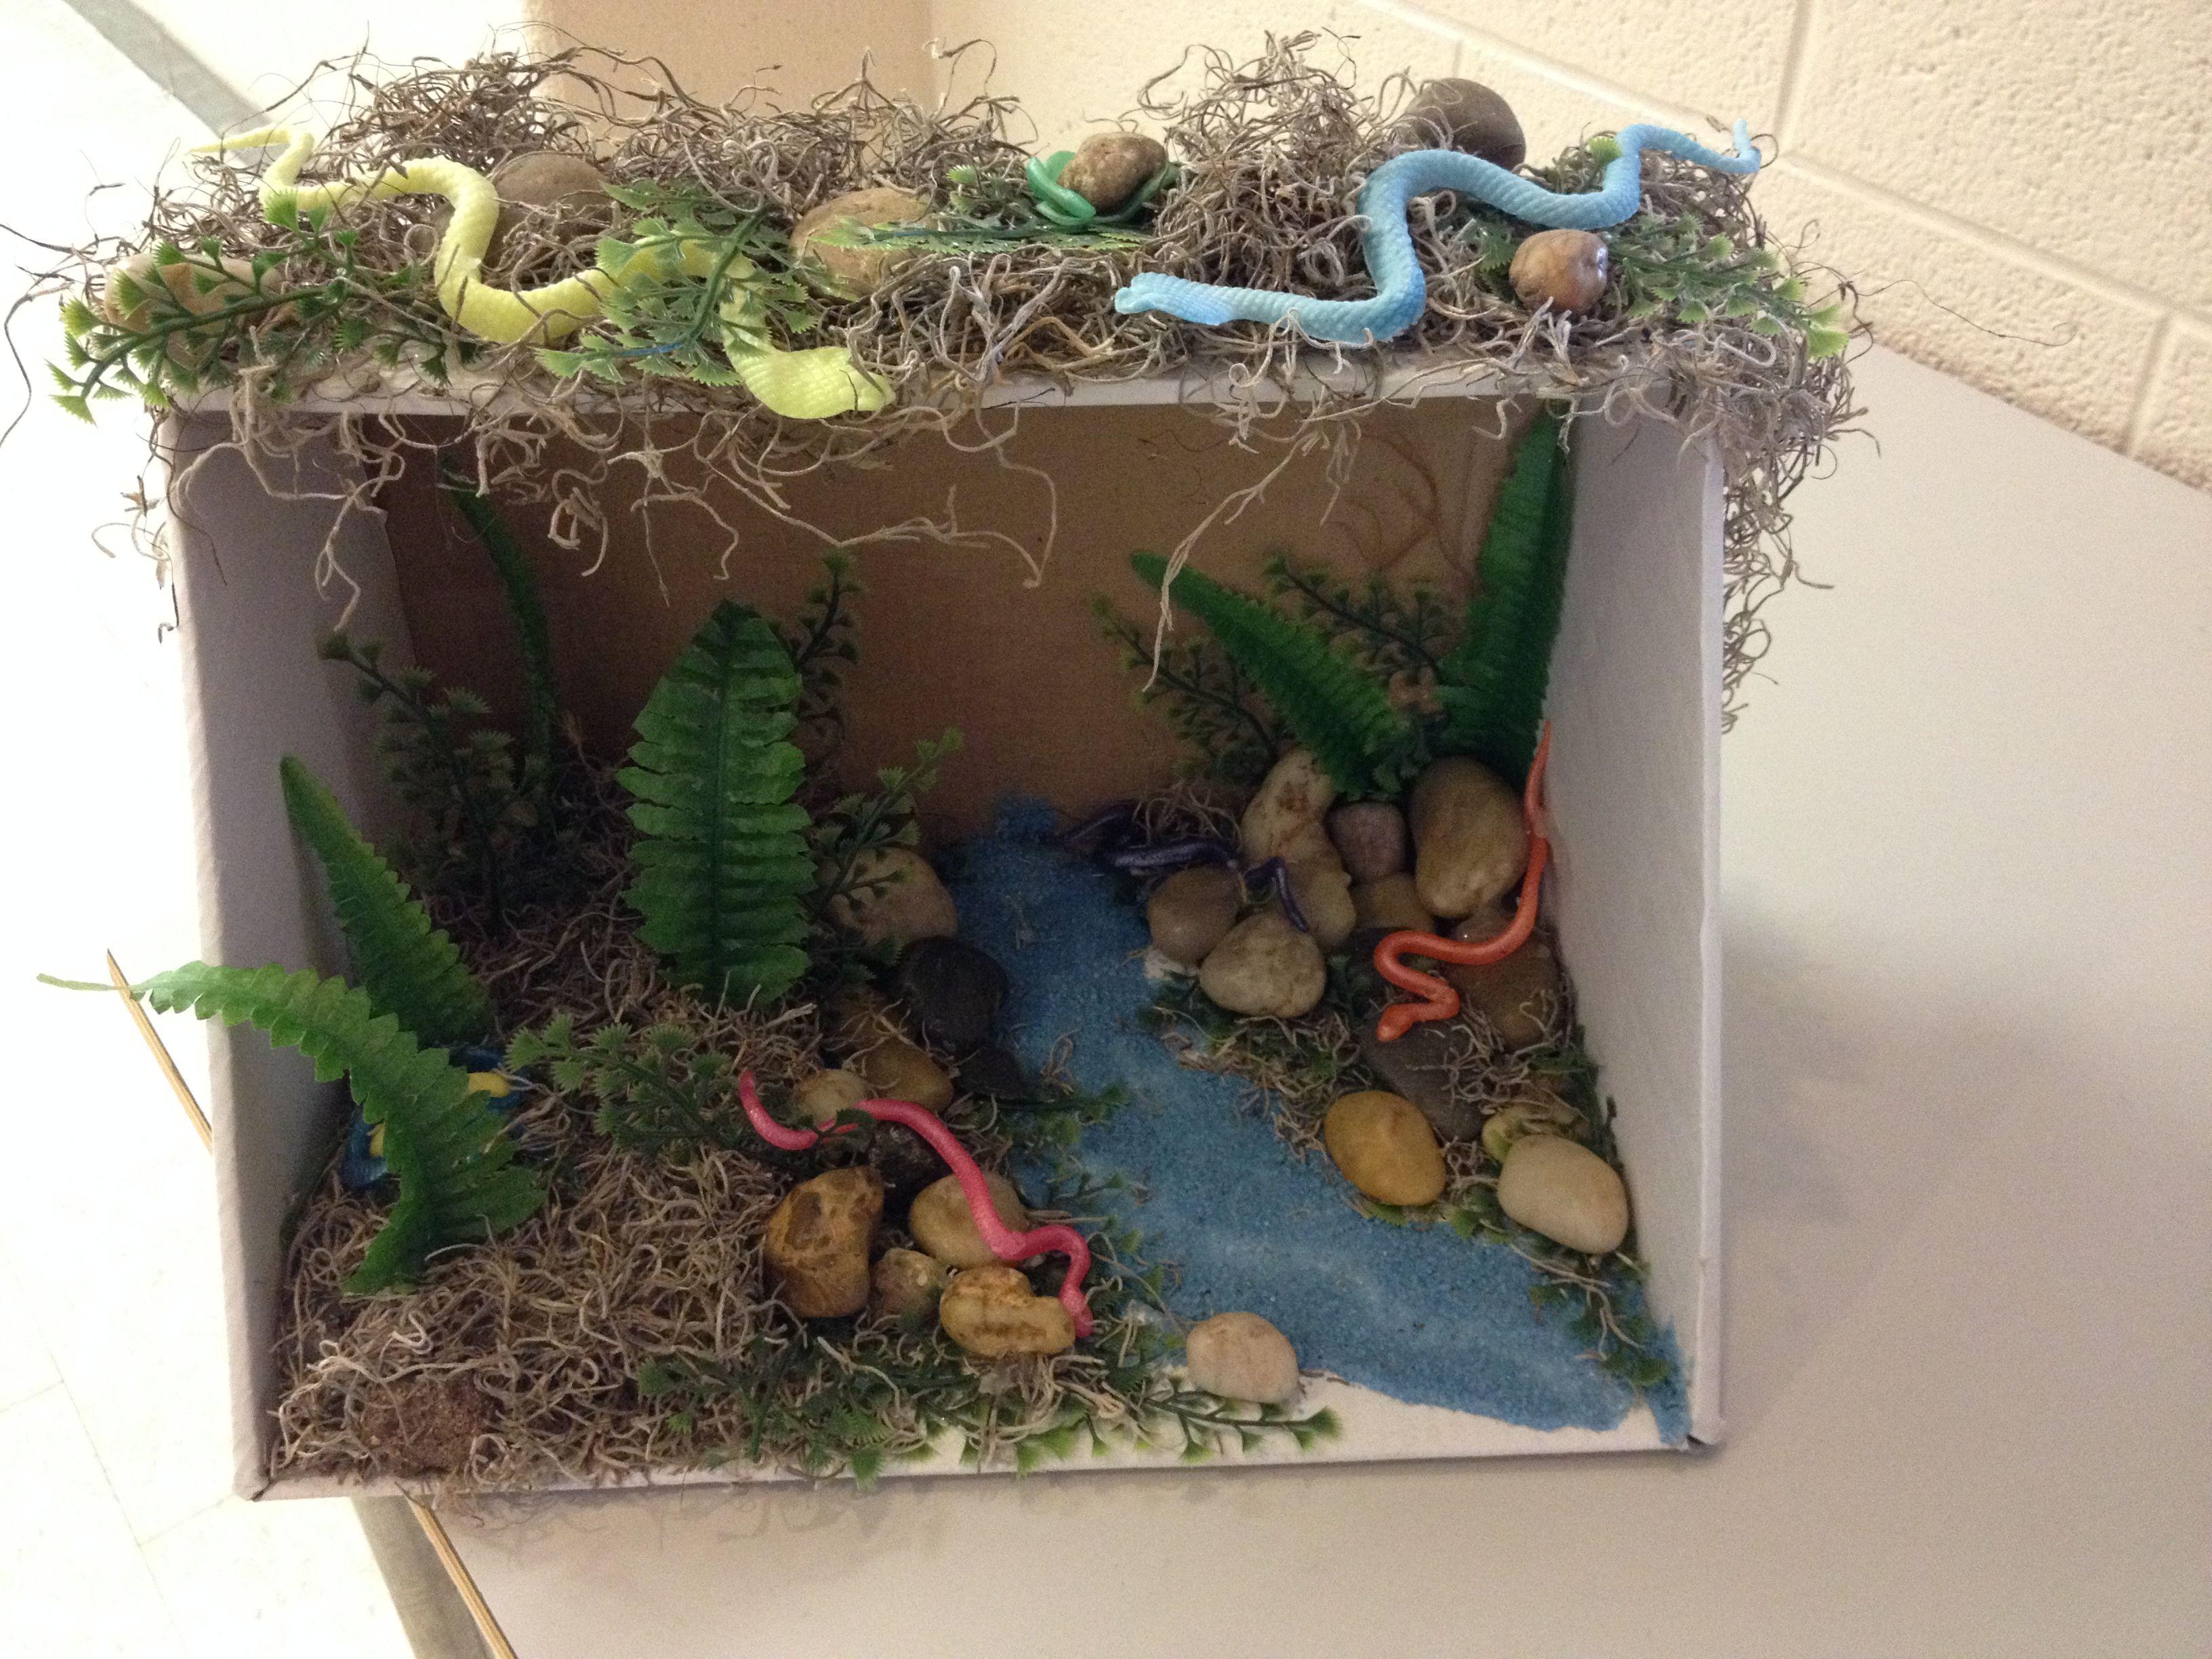 habitat diorama snakes dyi pinterest dioramas snake and school